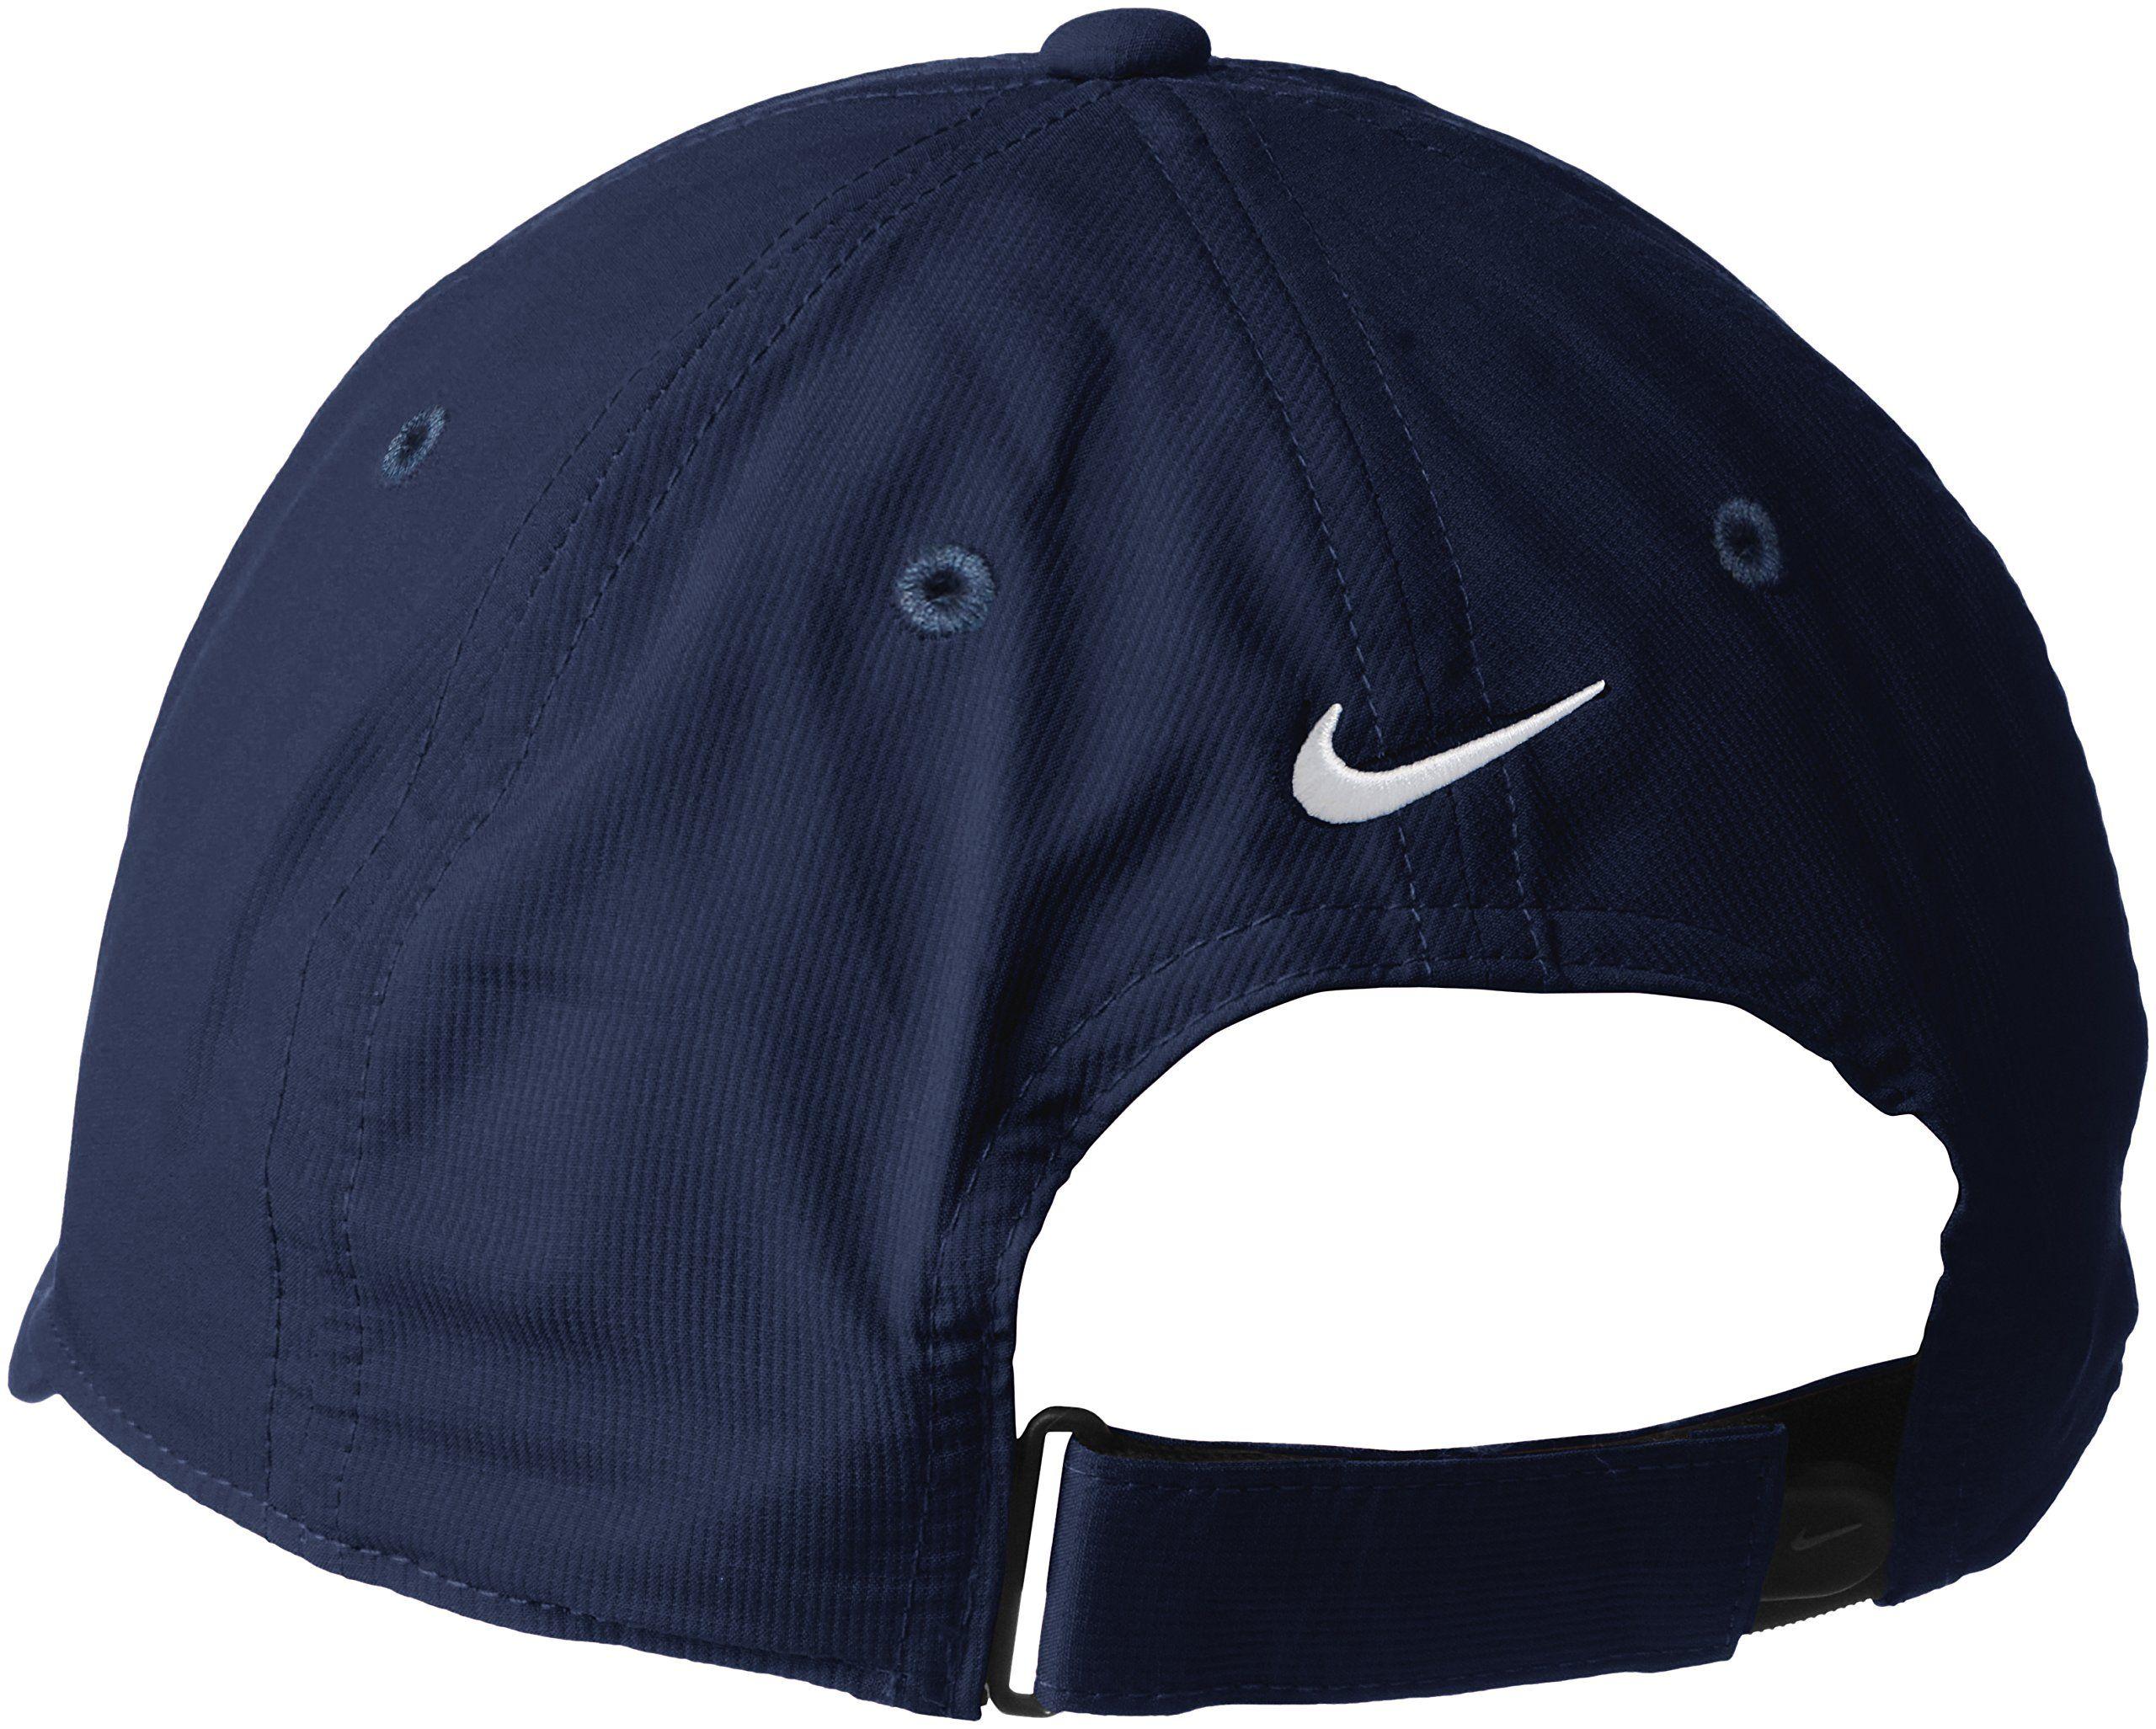 Women Golf Clothing - Nike Unisex Legacy 91 Tech Cap Midnight Navy WhiteOne  Size 41b9c04cc49c